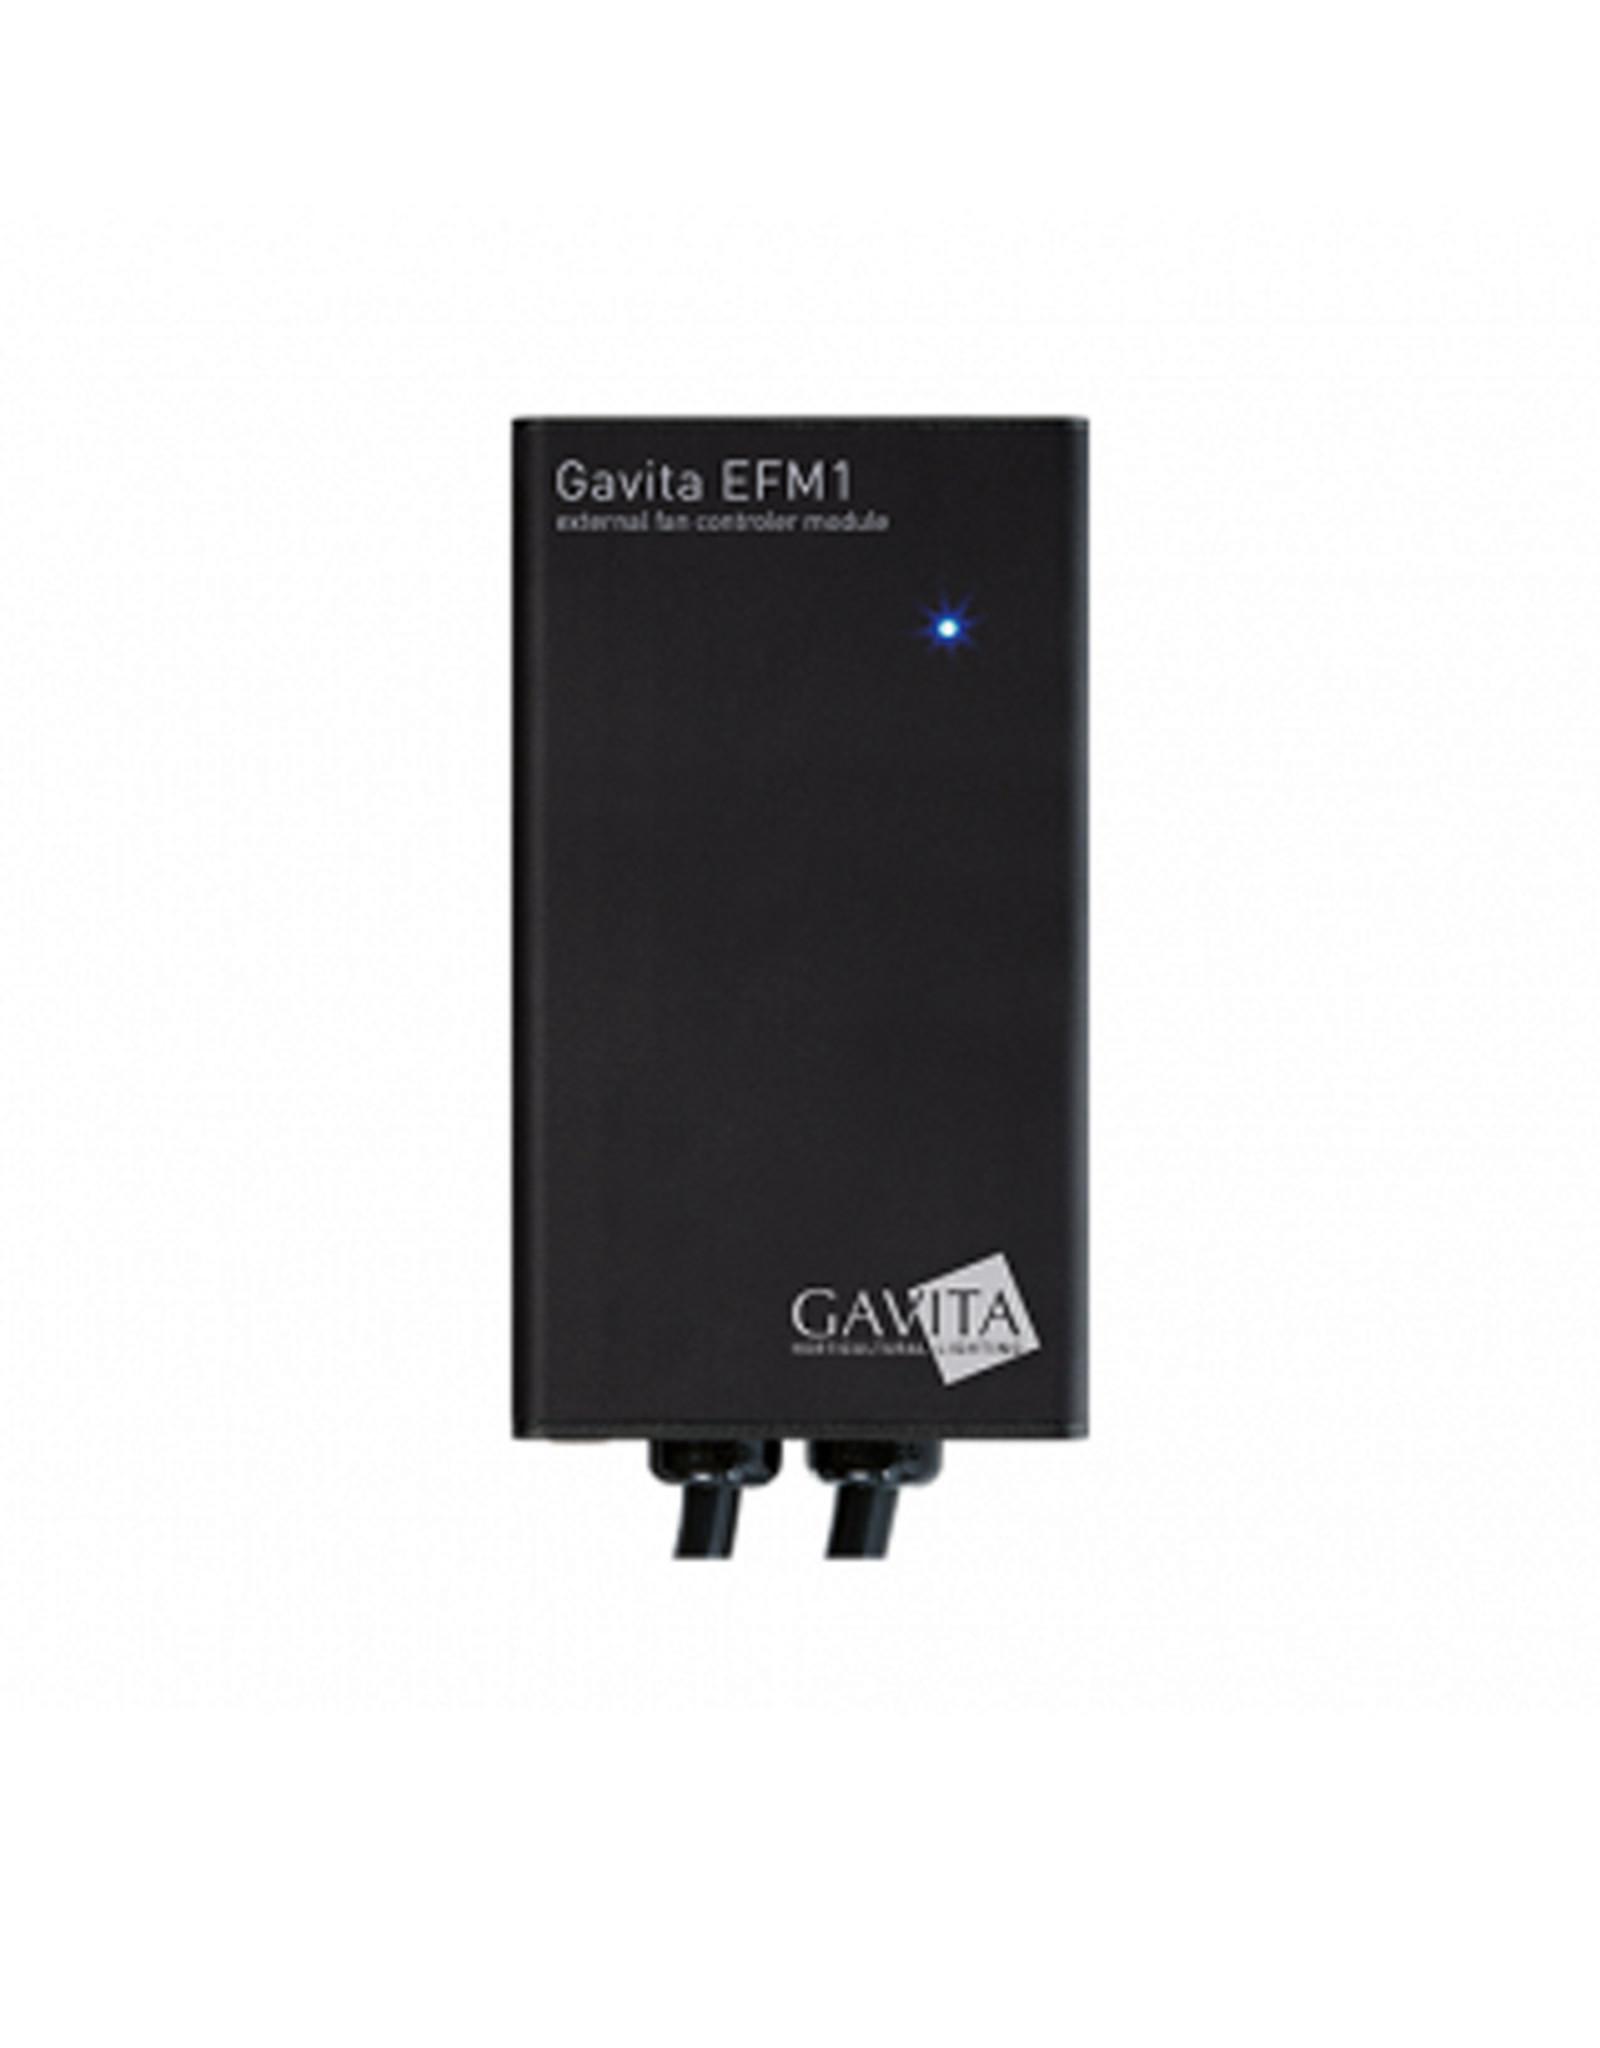 GAVITA GAVITA EFM1 EXTERNAL FAN CONTROLE MODULE